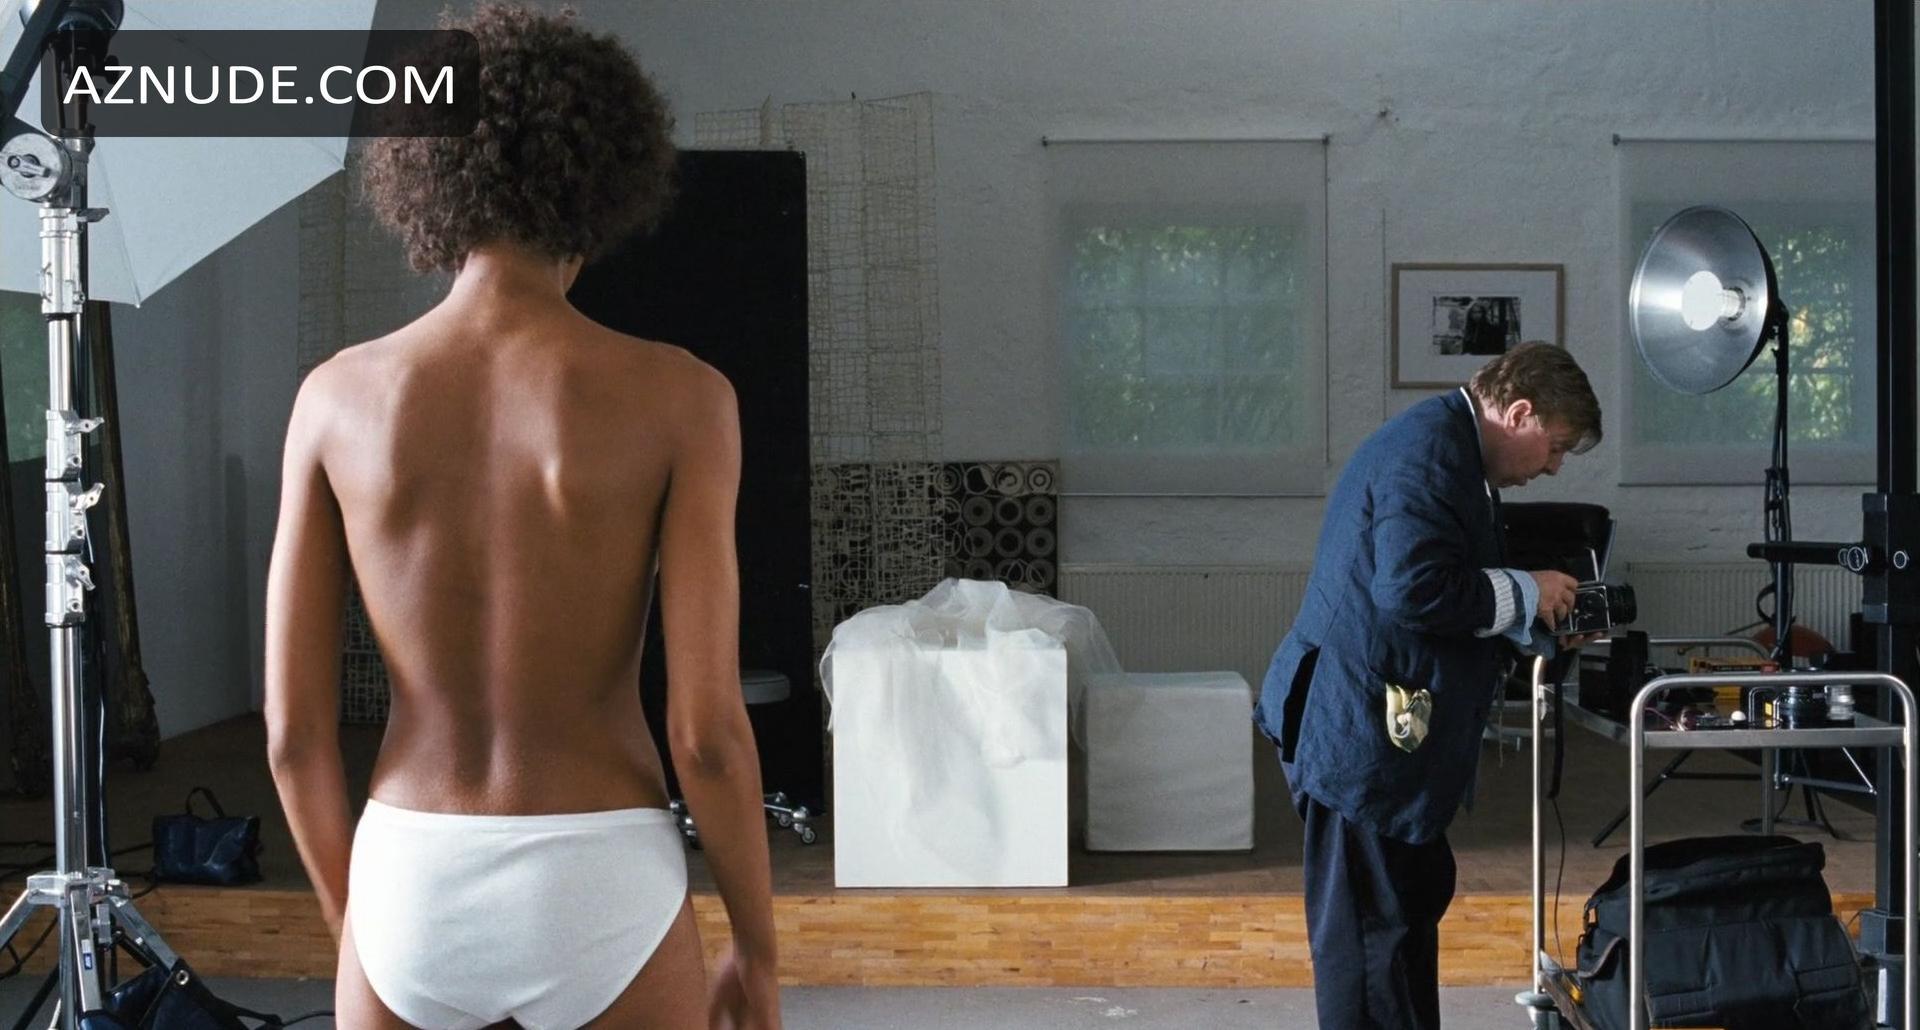 german teen nudism photos